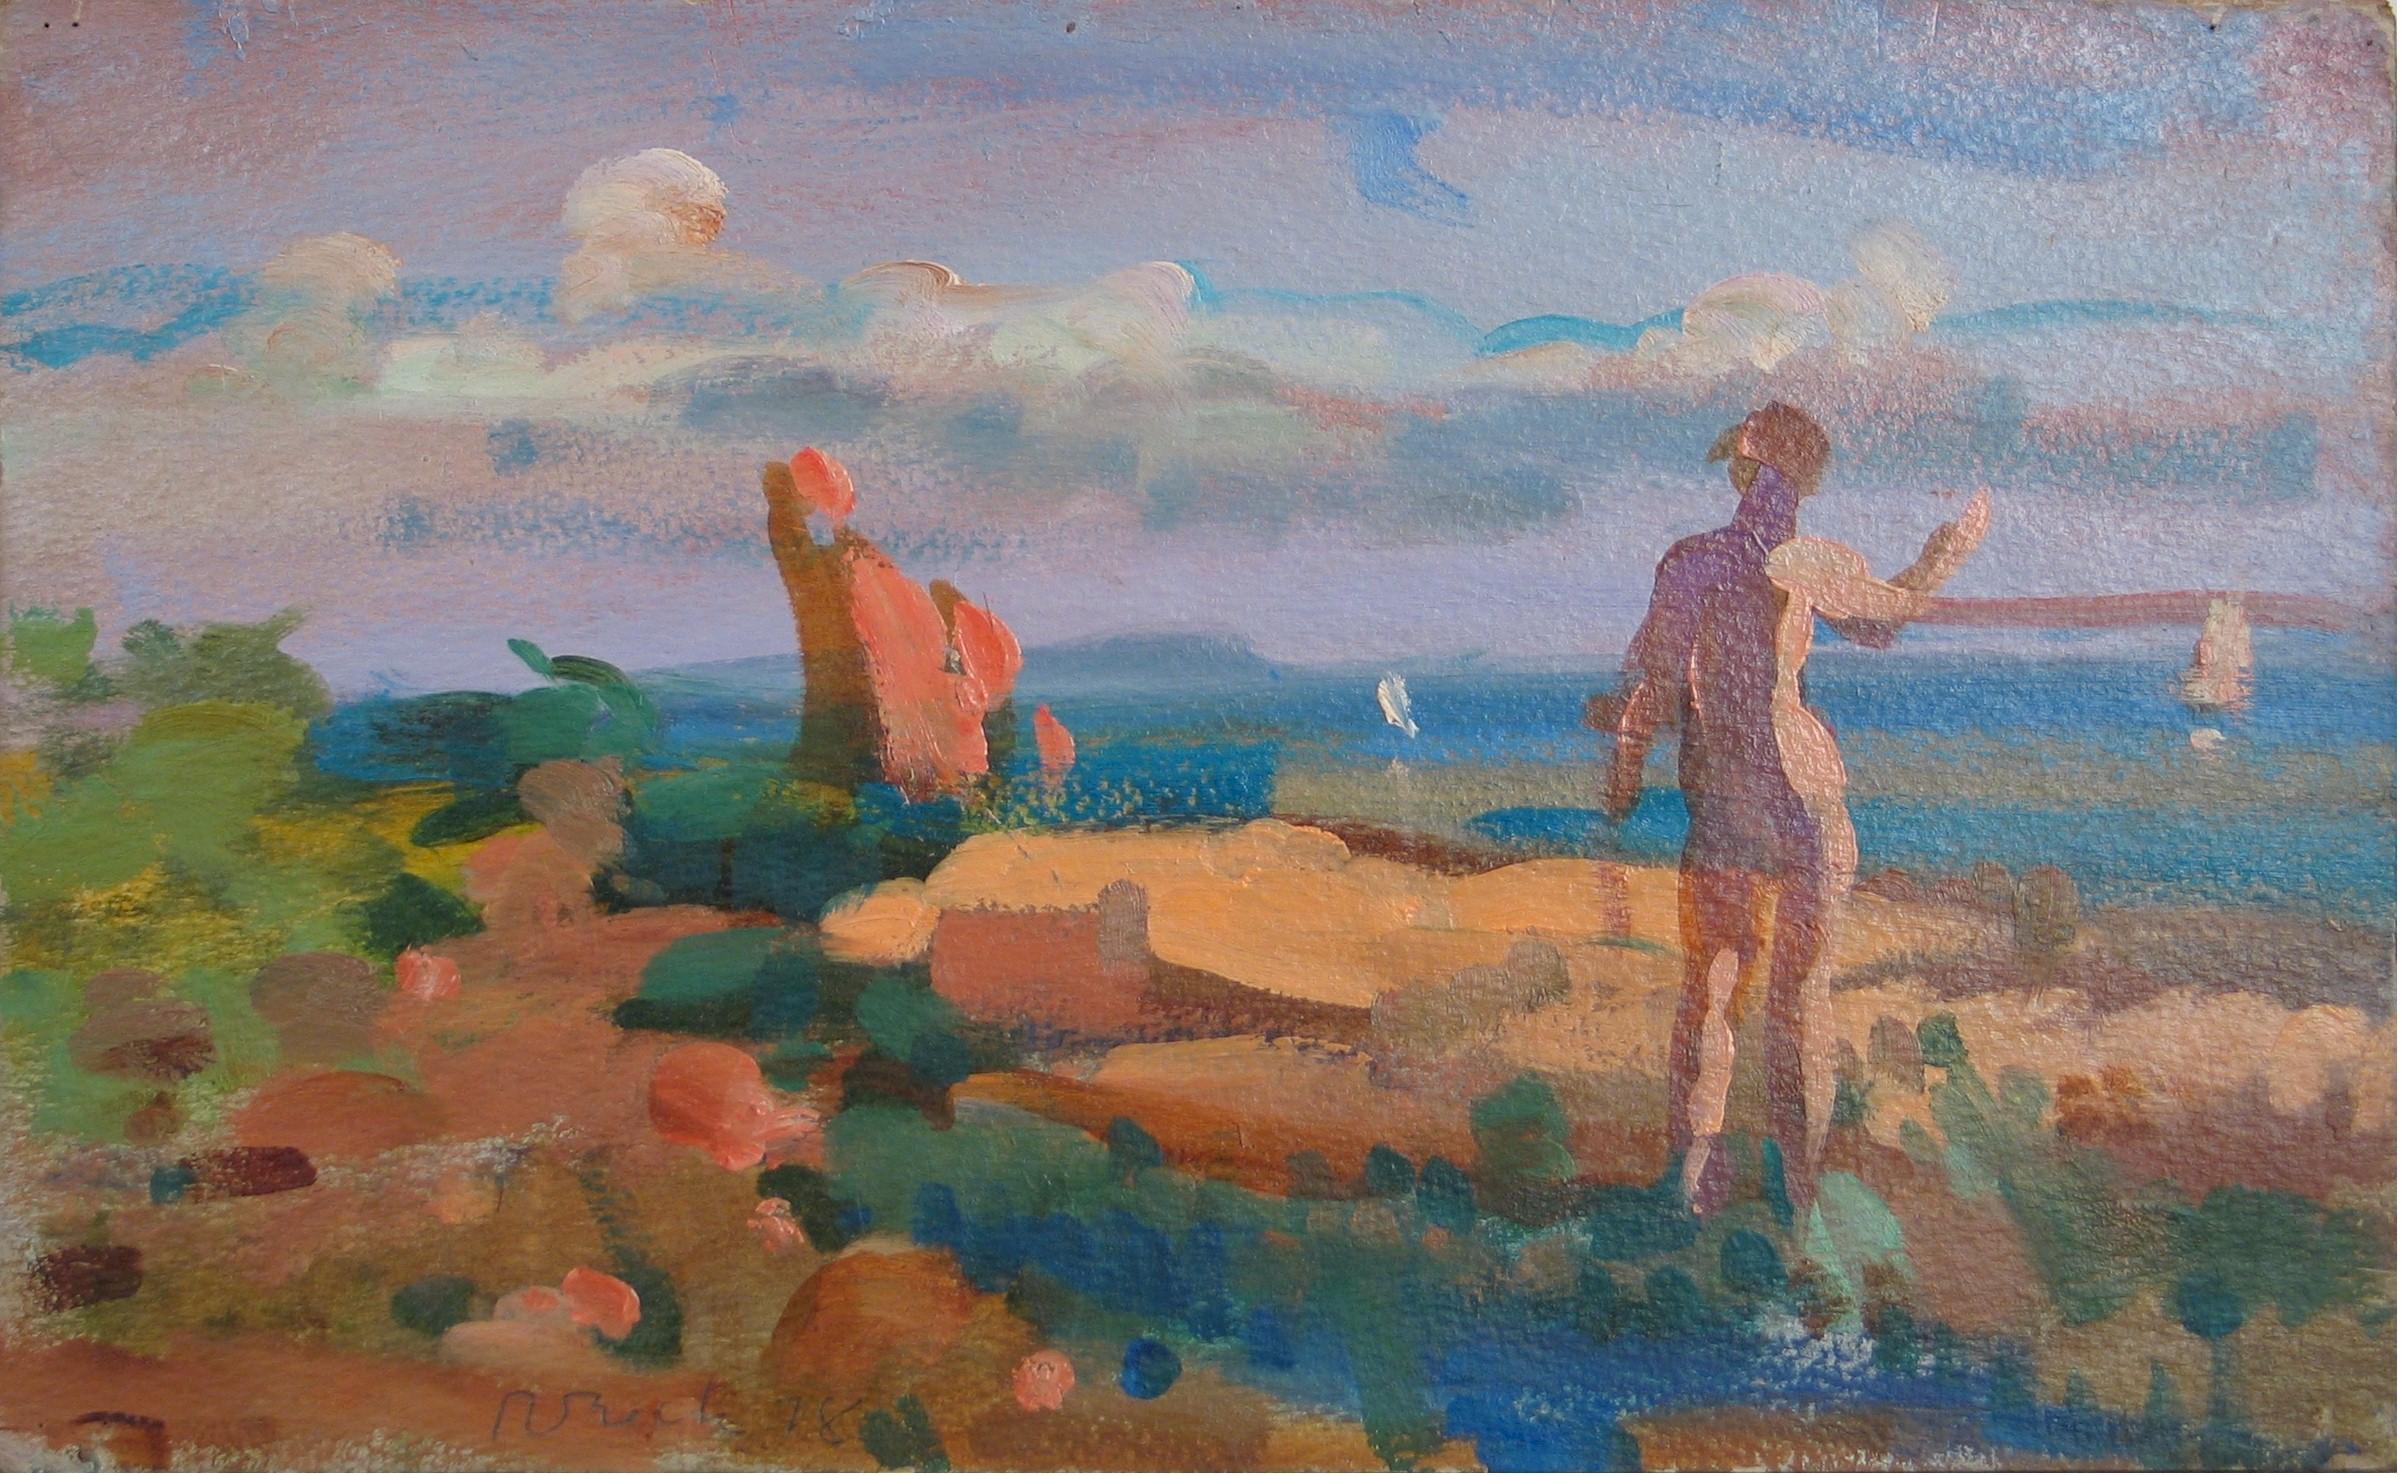 Rosemarie Beck, Ariel, 1978